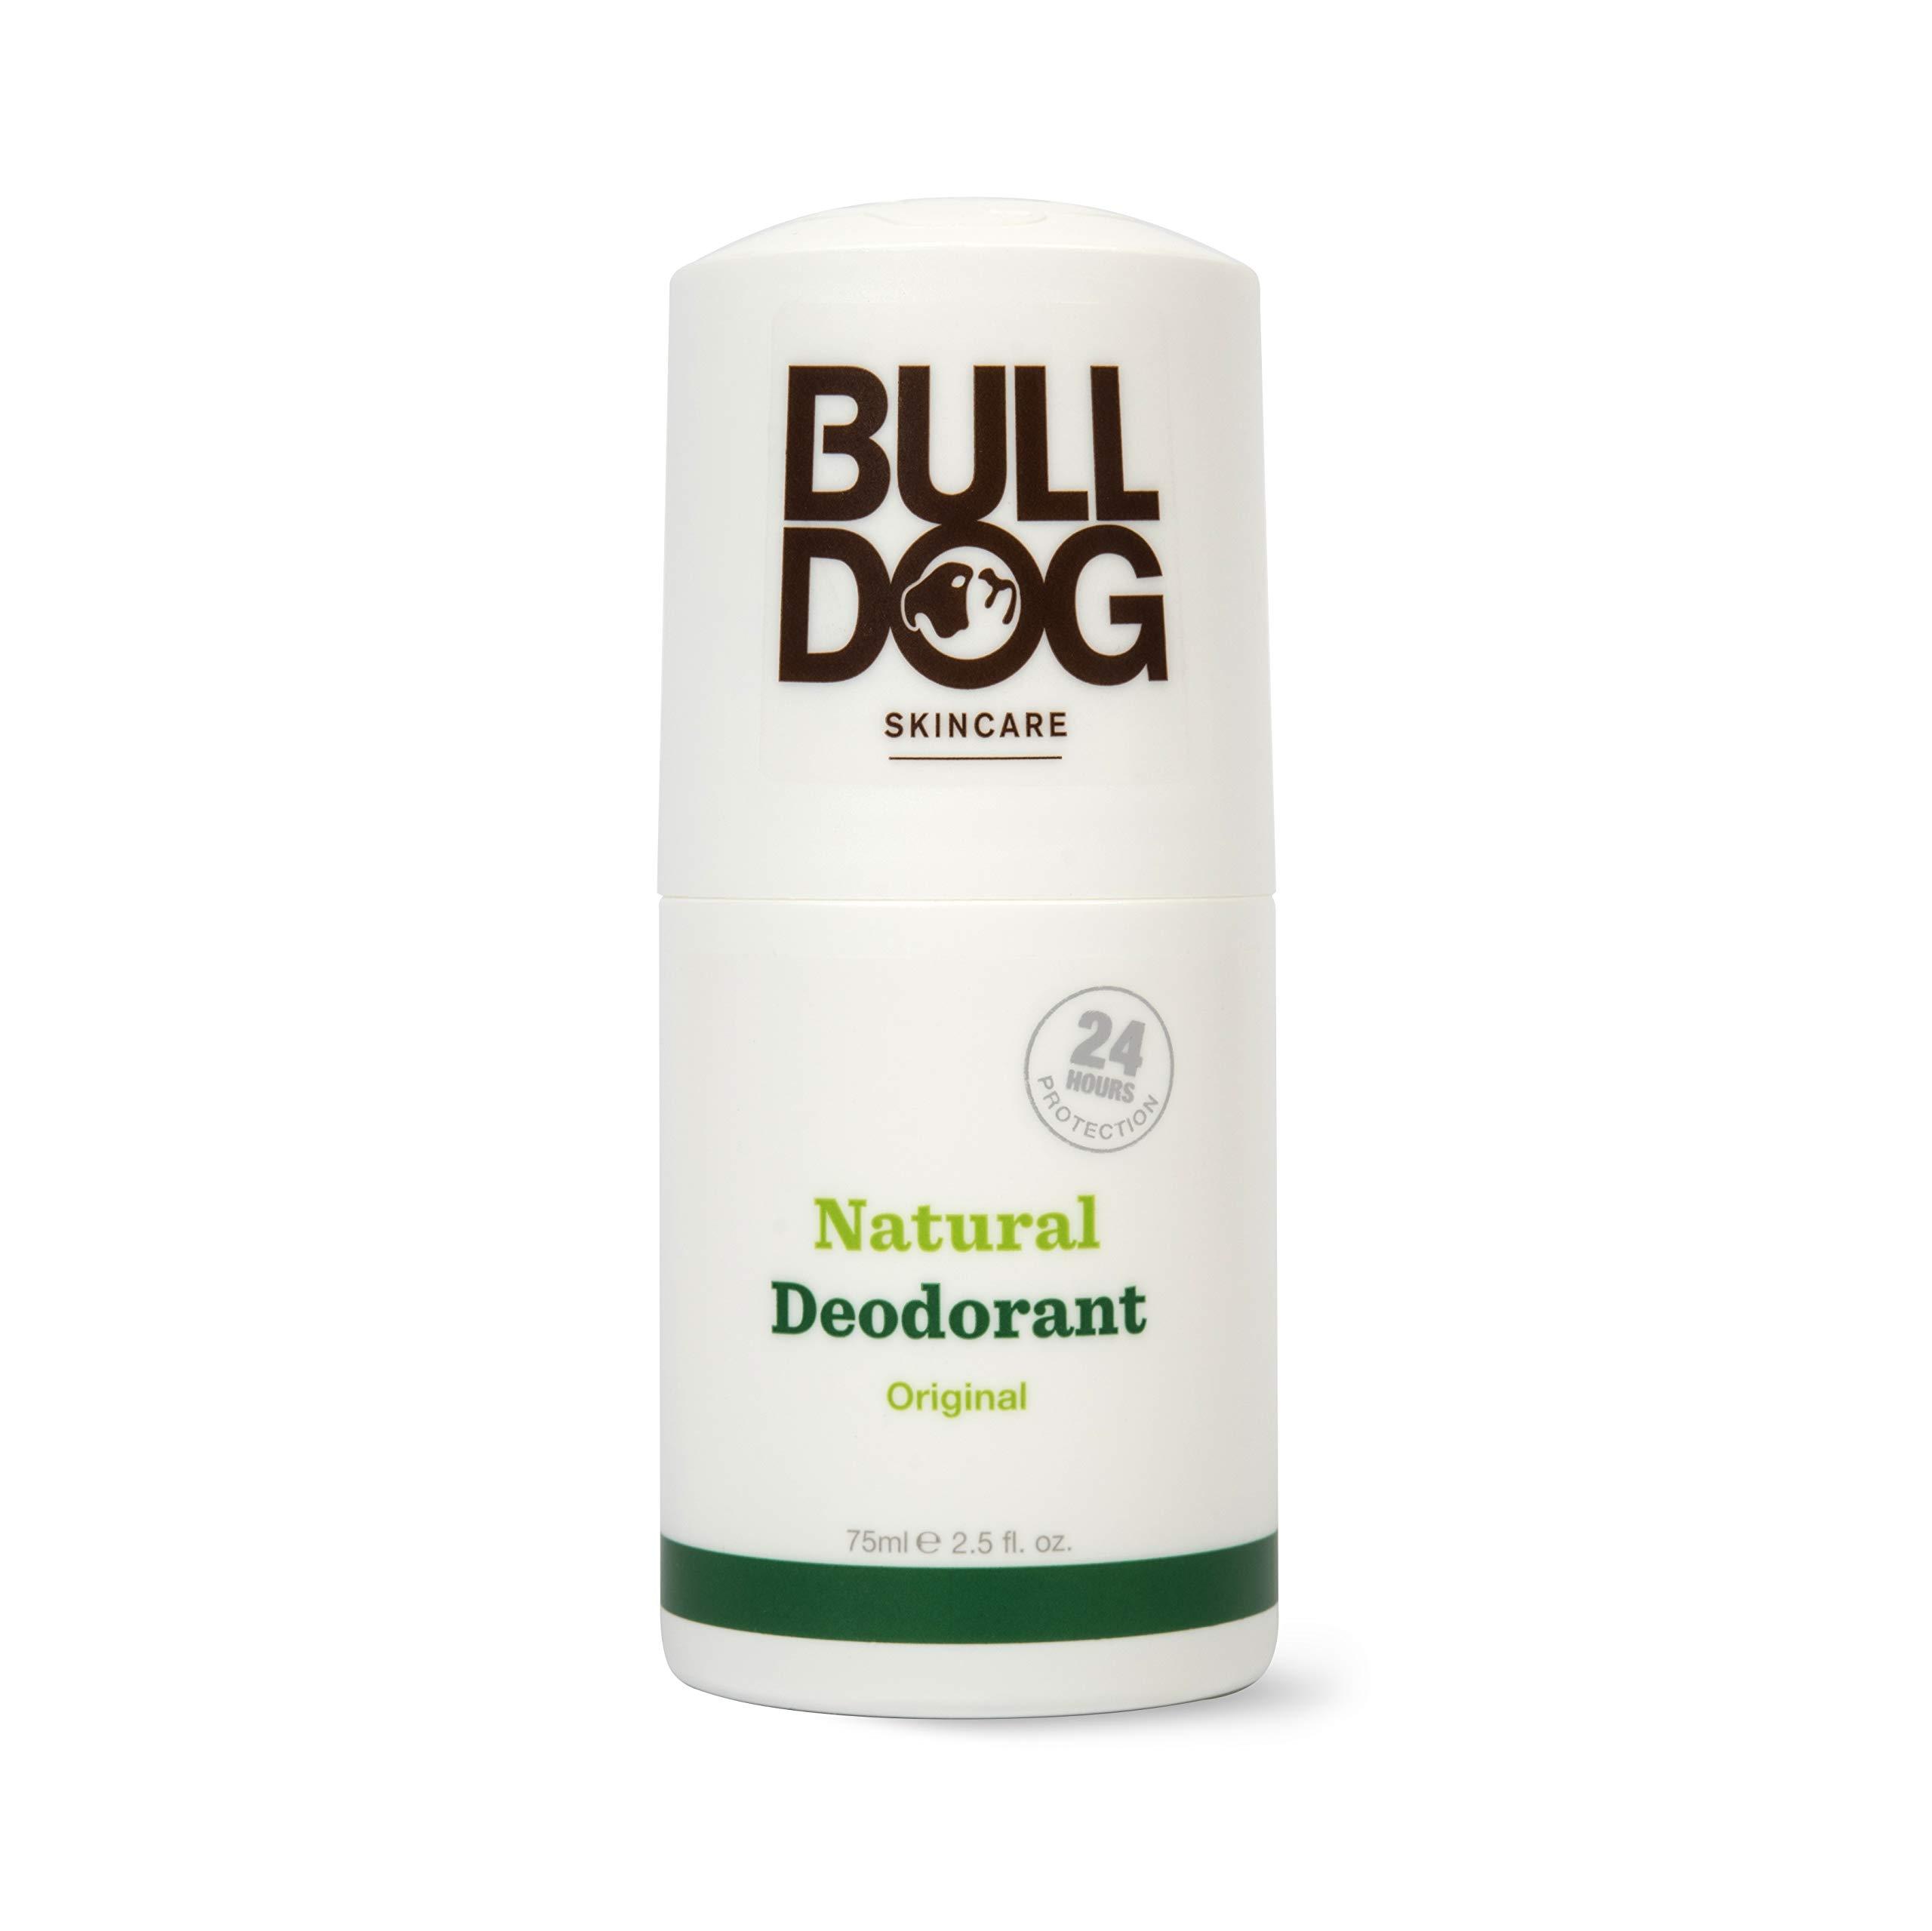 Bulldog Skincare Original Roll On Natural Deodorant 75ml